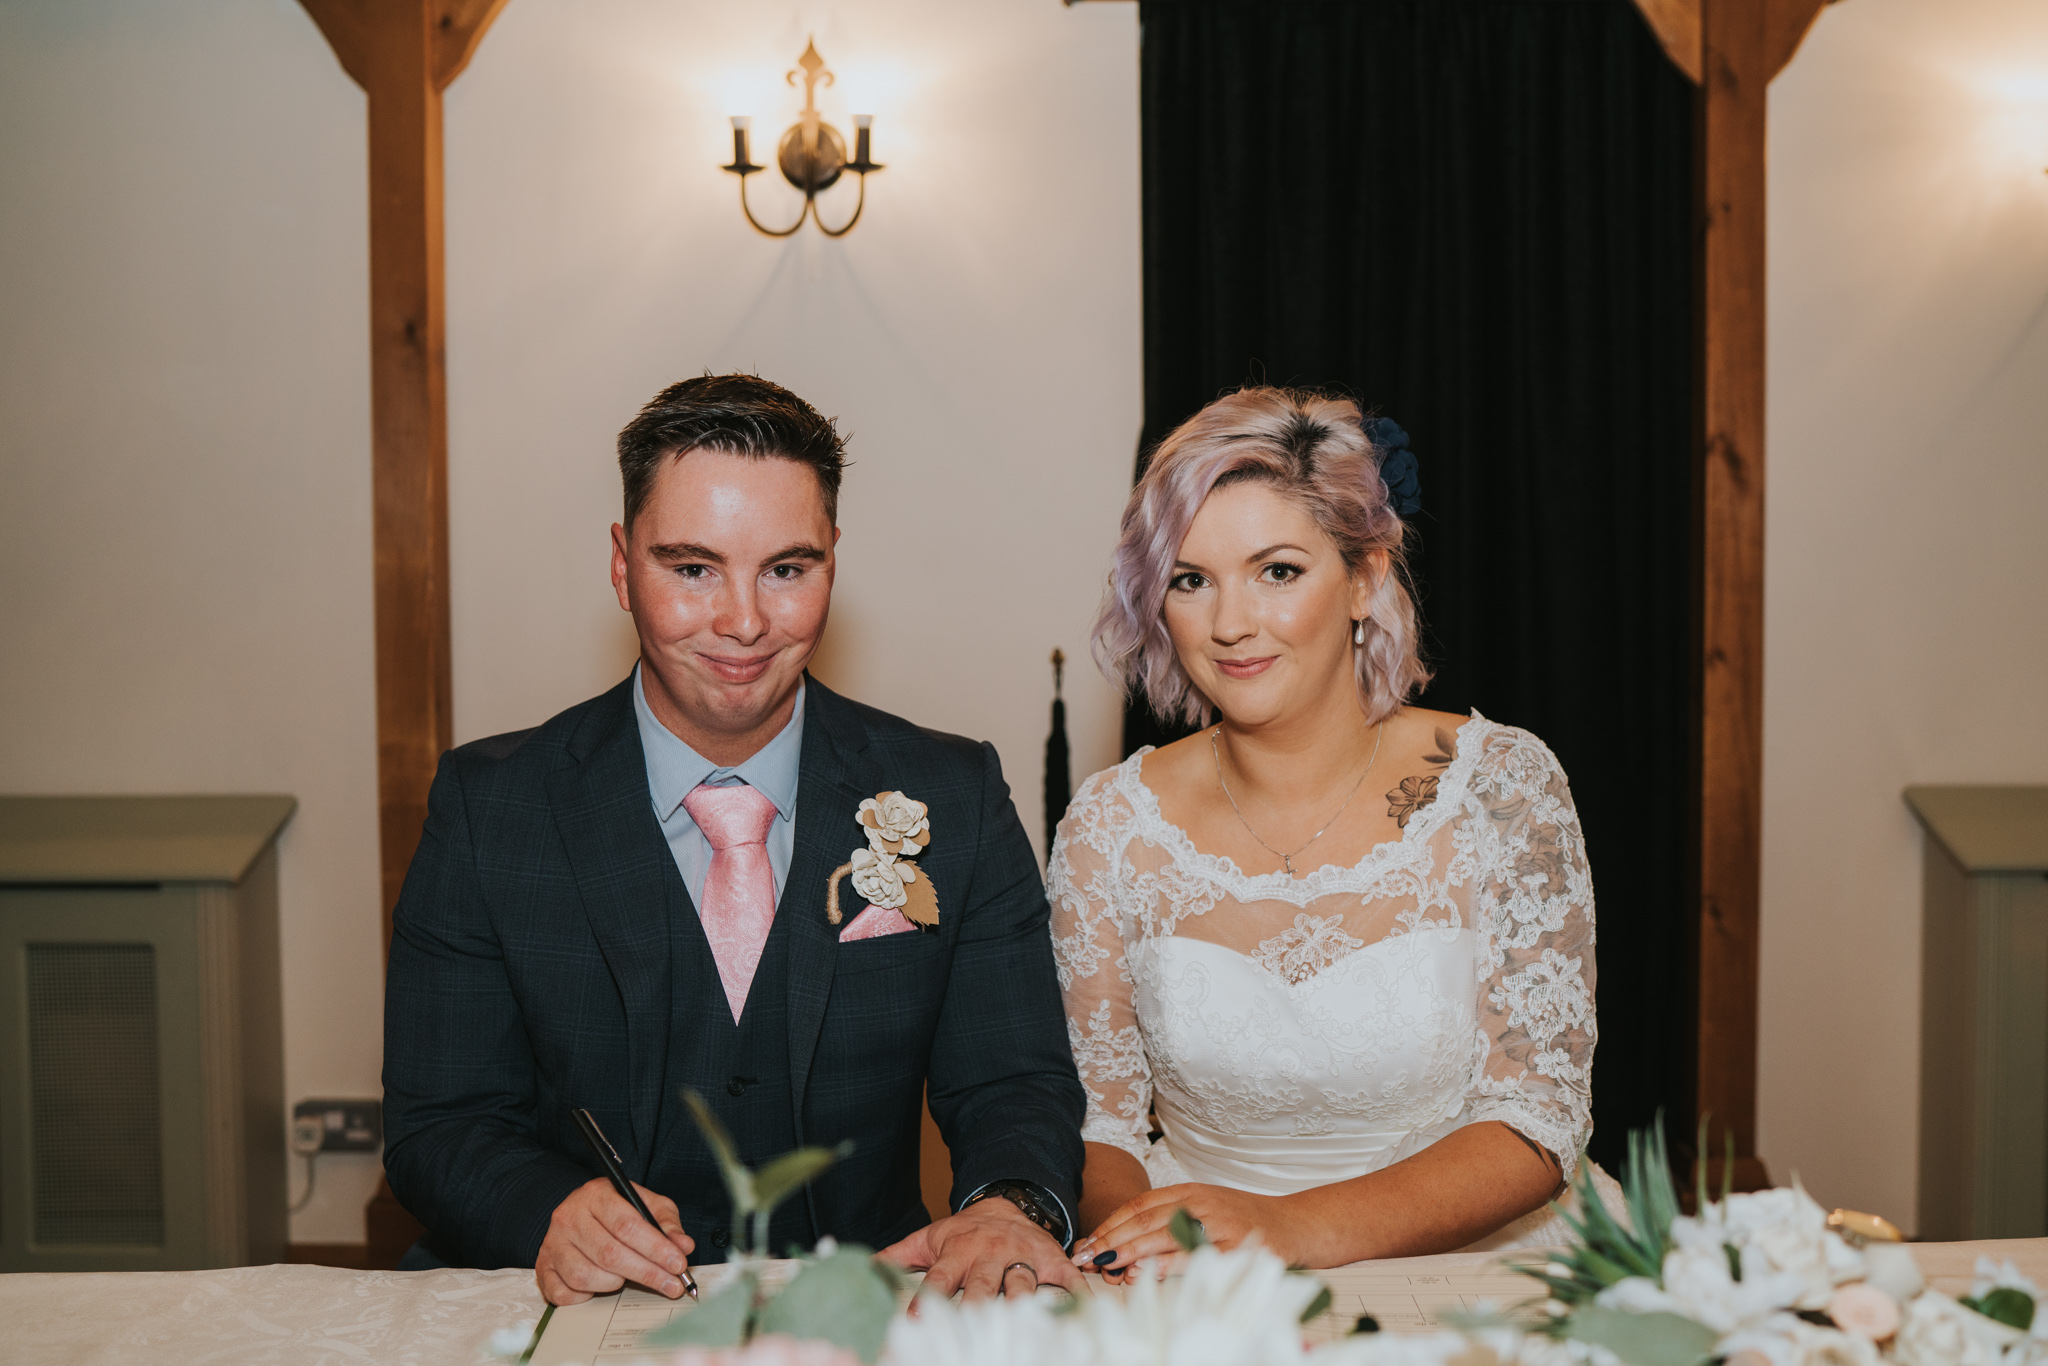 rhia-james-rustic-crabbs-barn-vintage-50s-retro-wedding-grace-elizabeth-colchester-essex-alternative-relaxed-wedding-family-photography-devon-suffolk-norfolk-essex (79 of 138).jpg